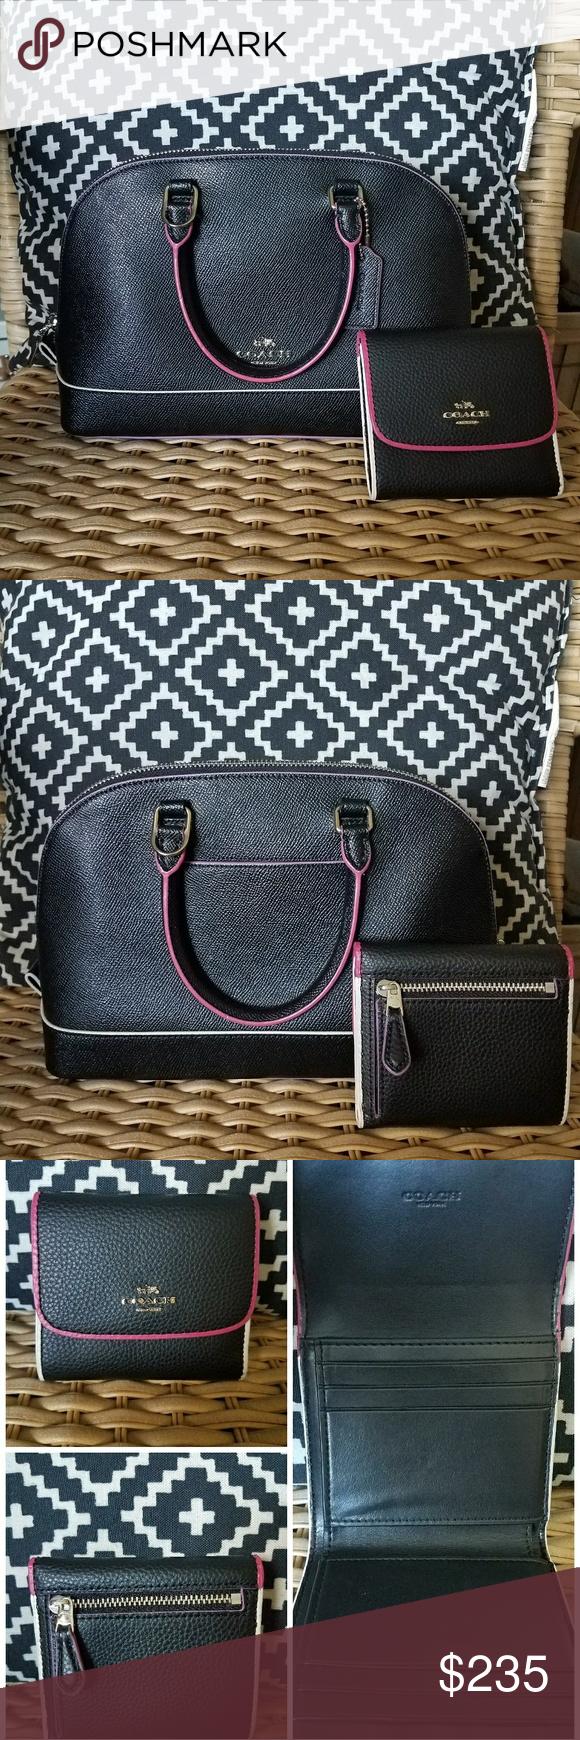 Coach Mini Sierra satchel with matching wallet | Coach ...